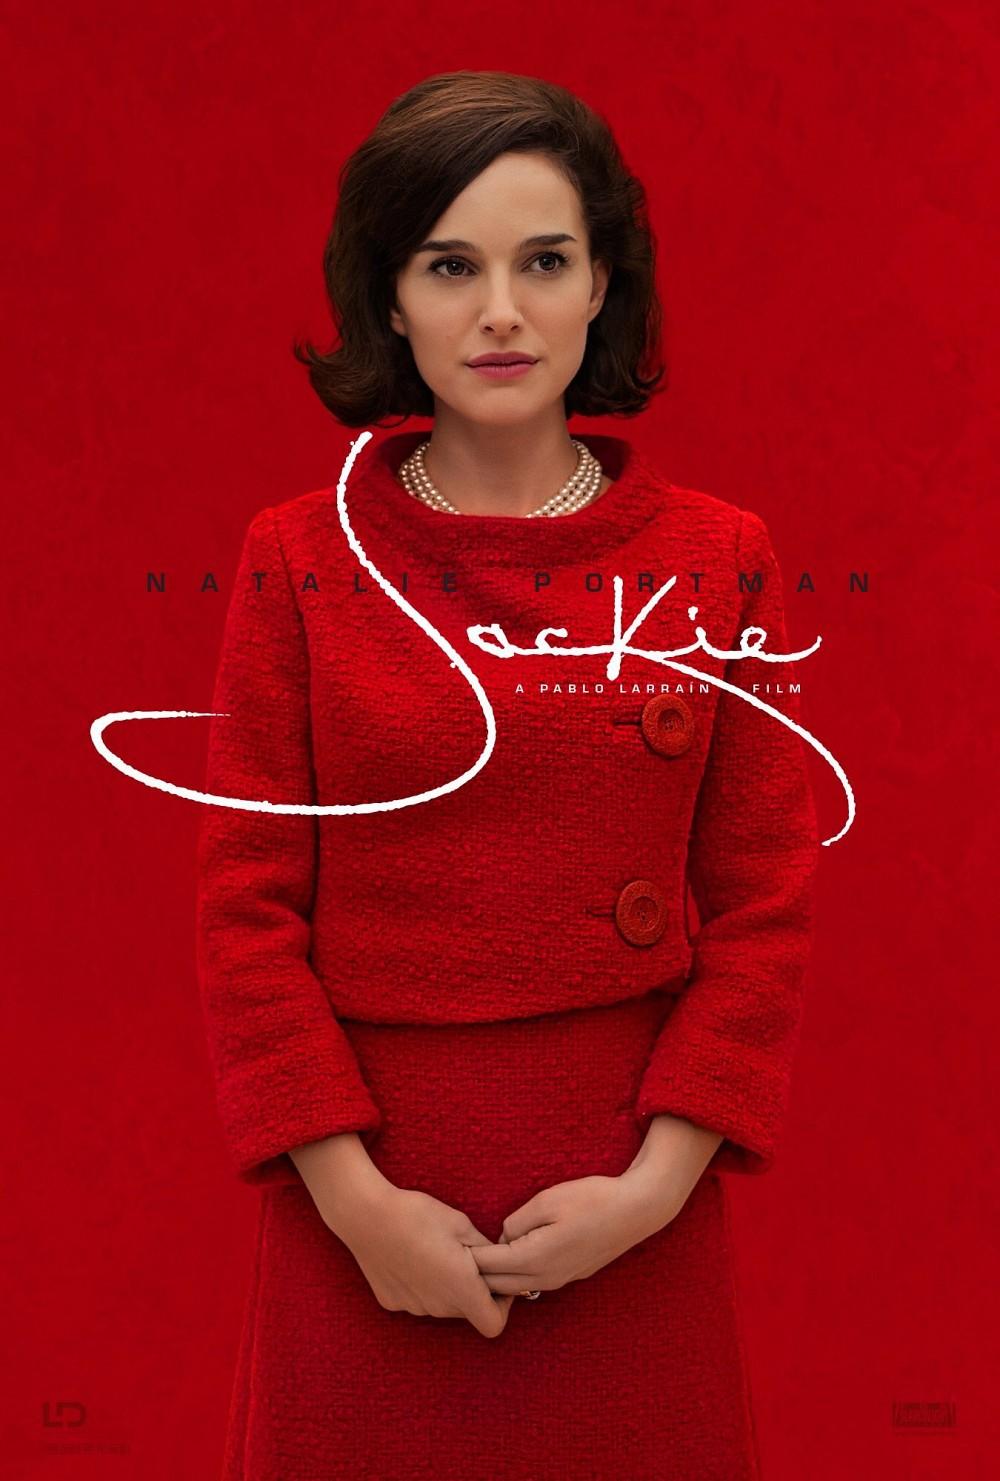 Jackie Trailer Natalie Portman MovieSpoon.com